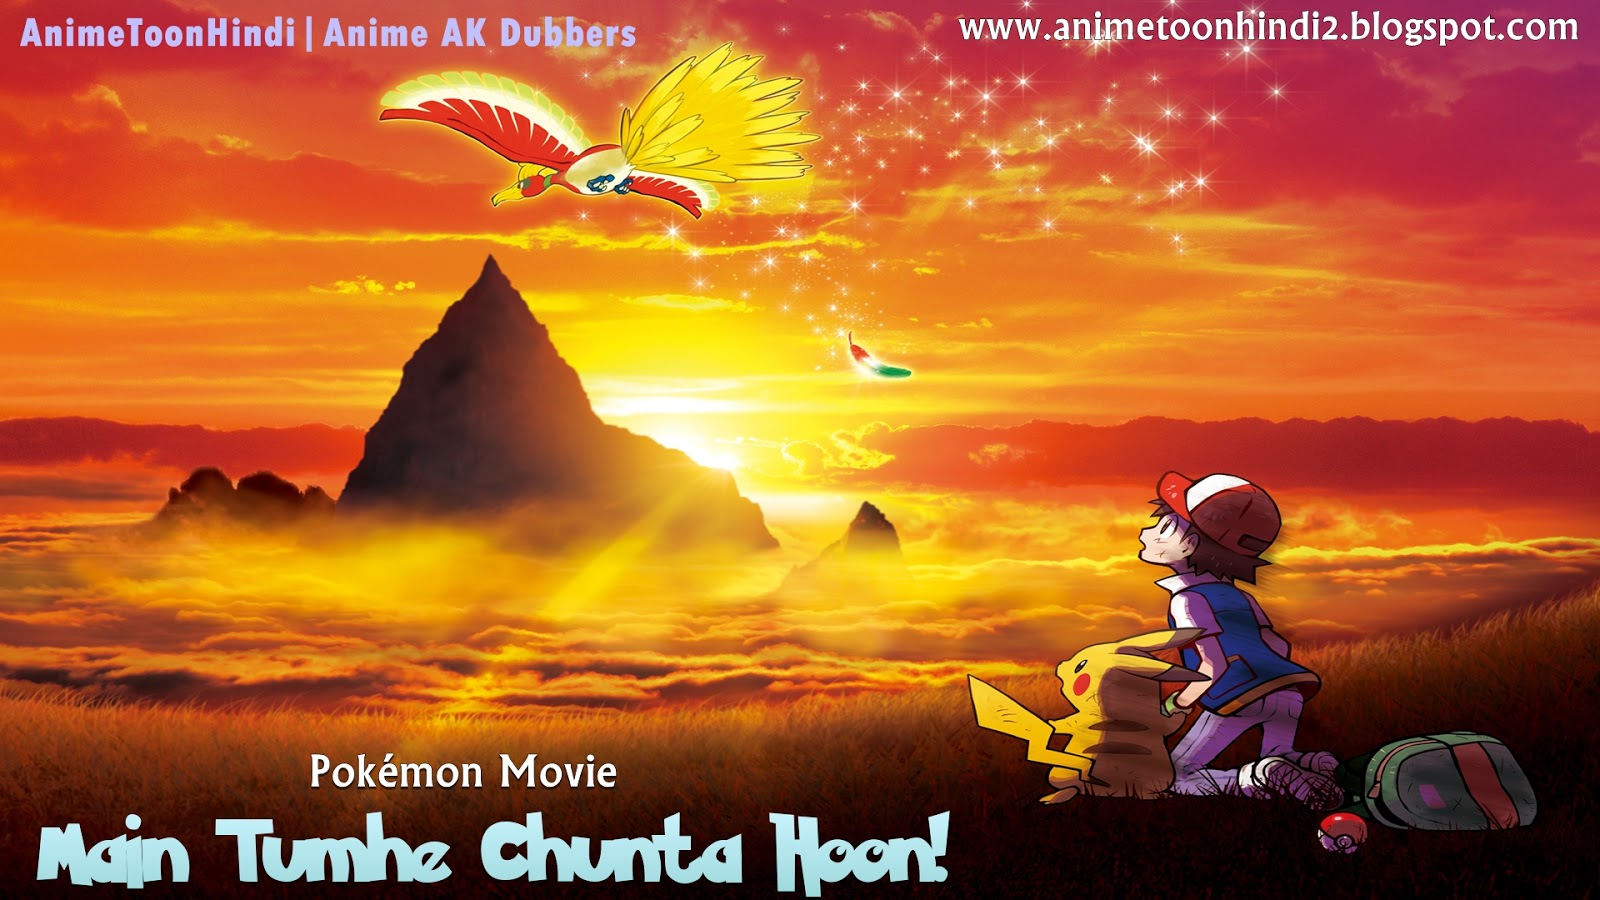 pokemon movie i choose you download in hindi